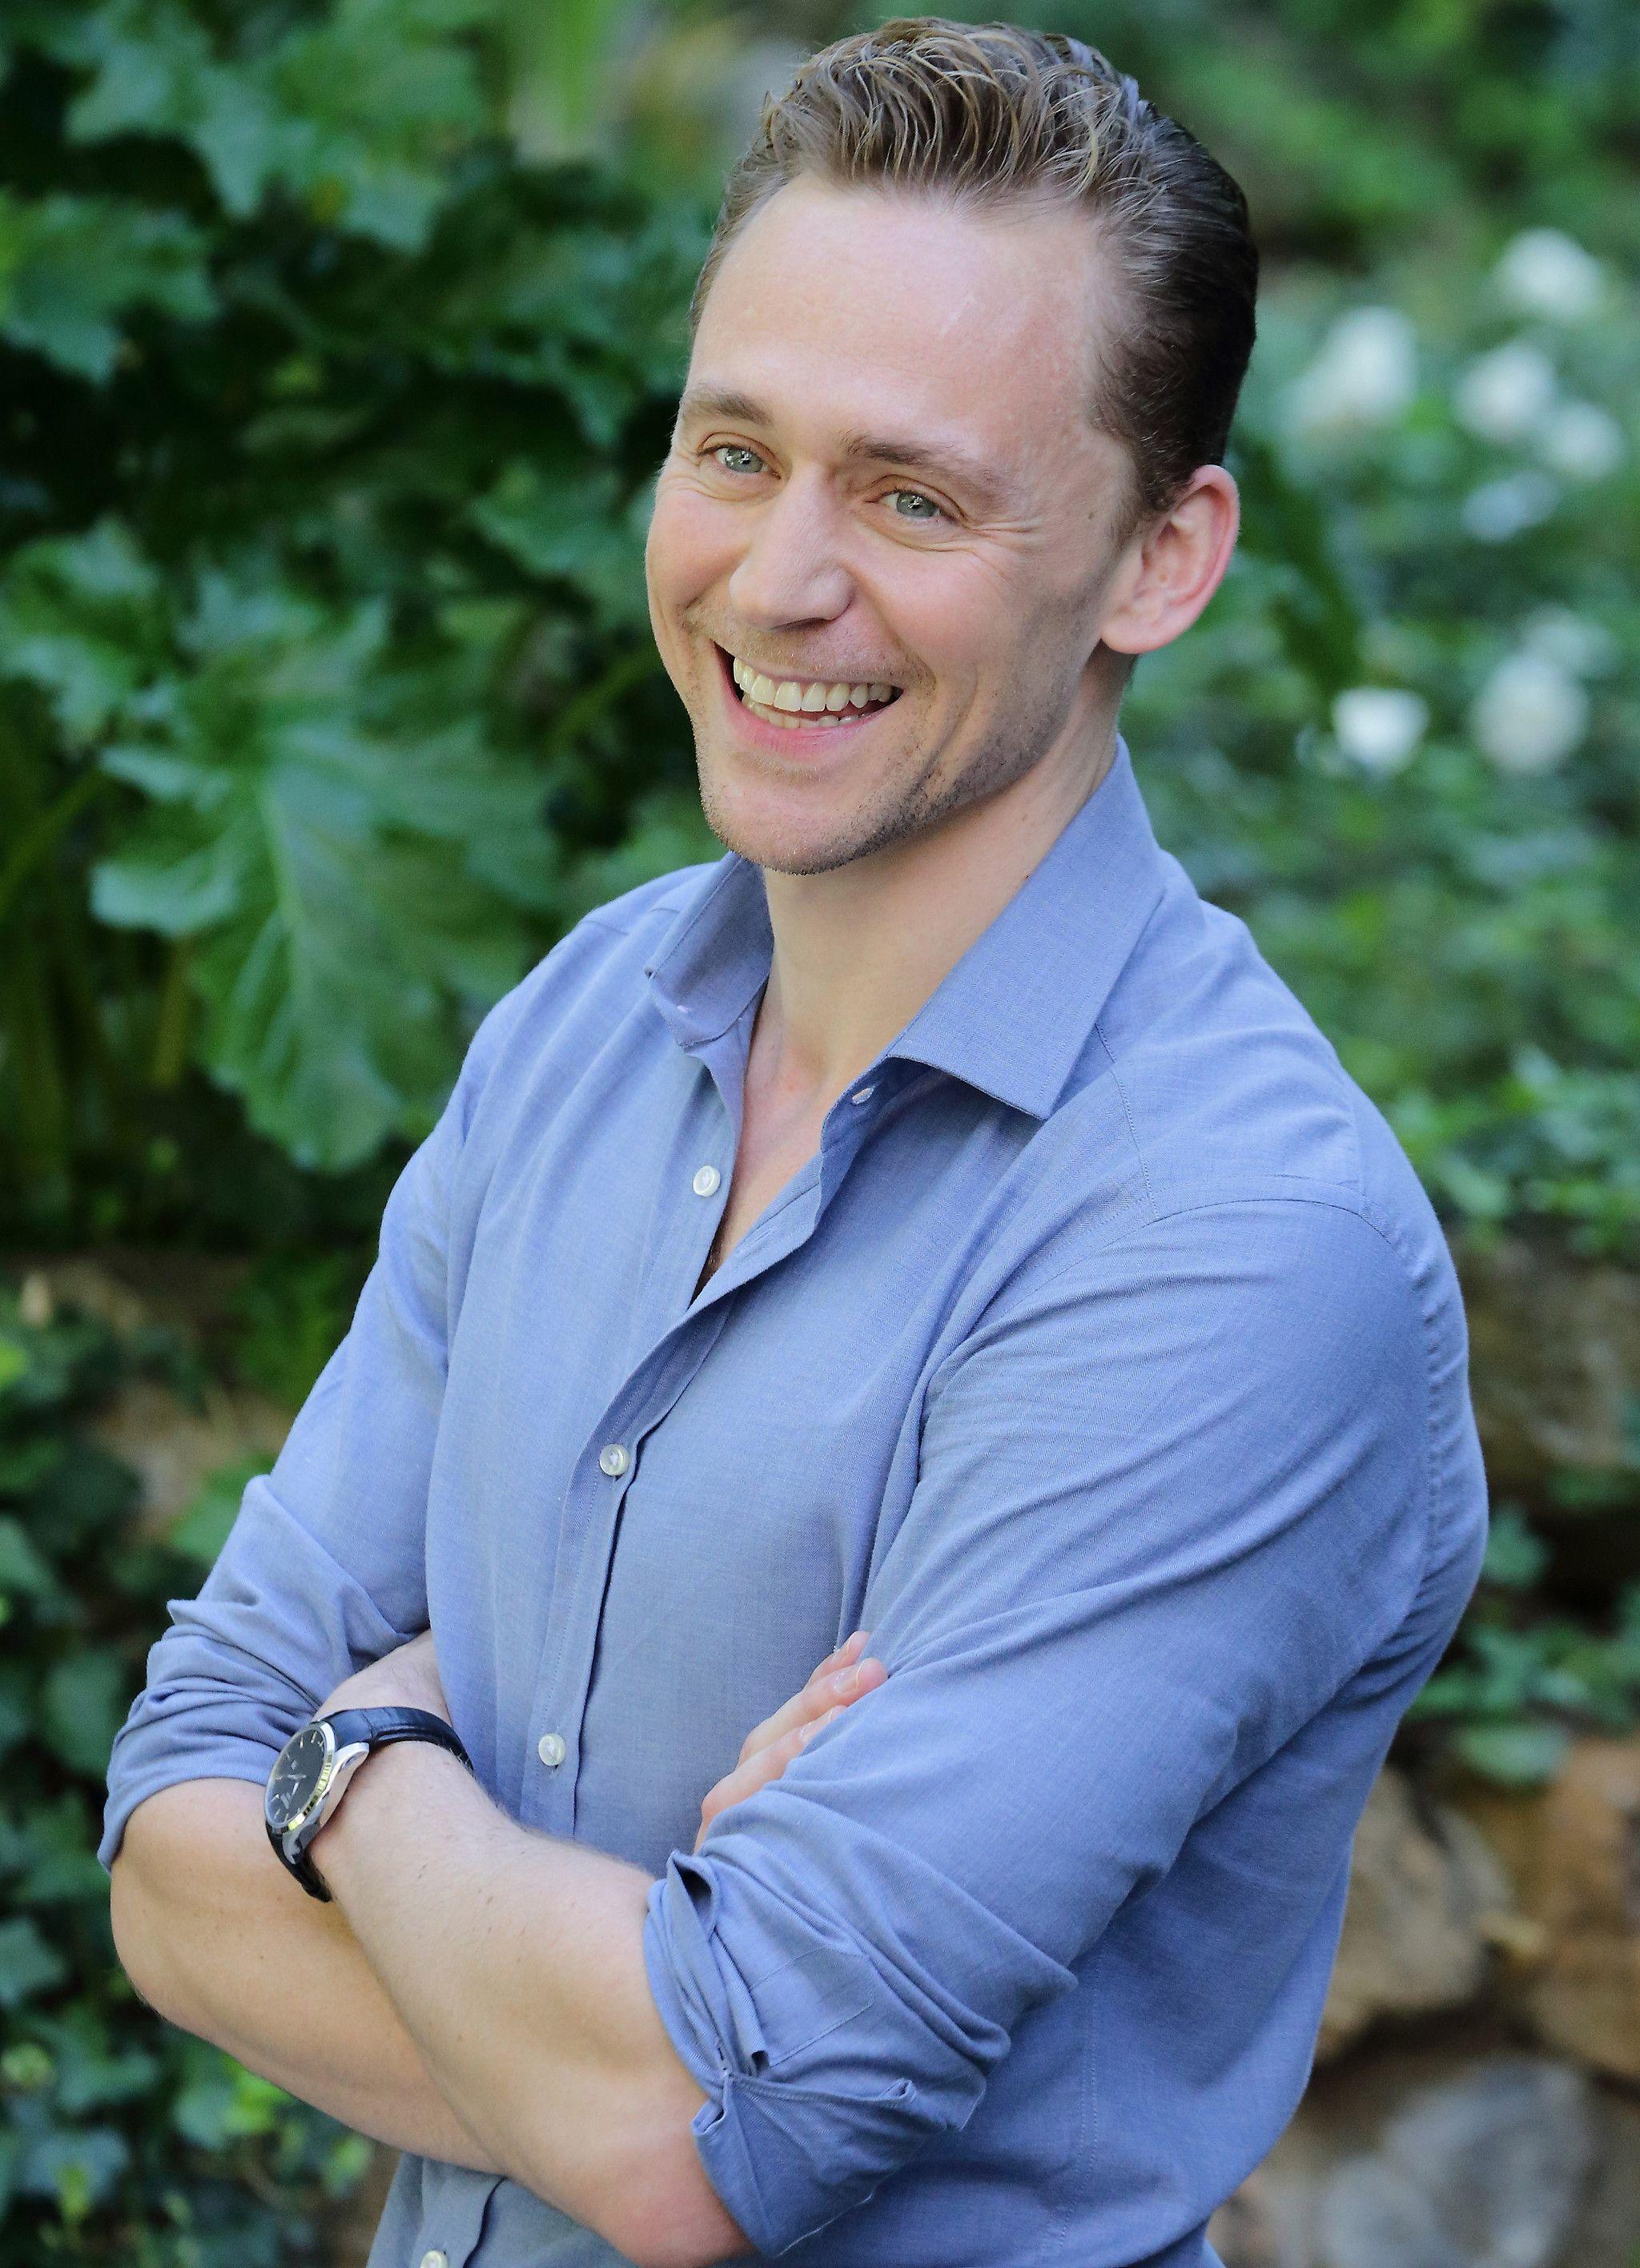 Tom Hiddleston @ the photocall for 'Crimson Peak' Le Jardin de Russie 28.9.2015 Rome, Italy Photo from http://www.weibo.com/torilla